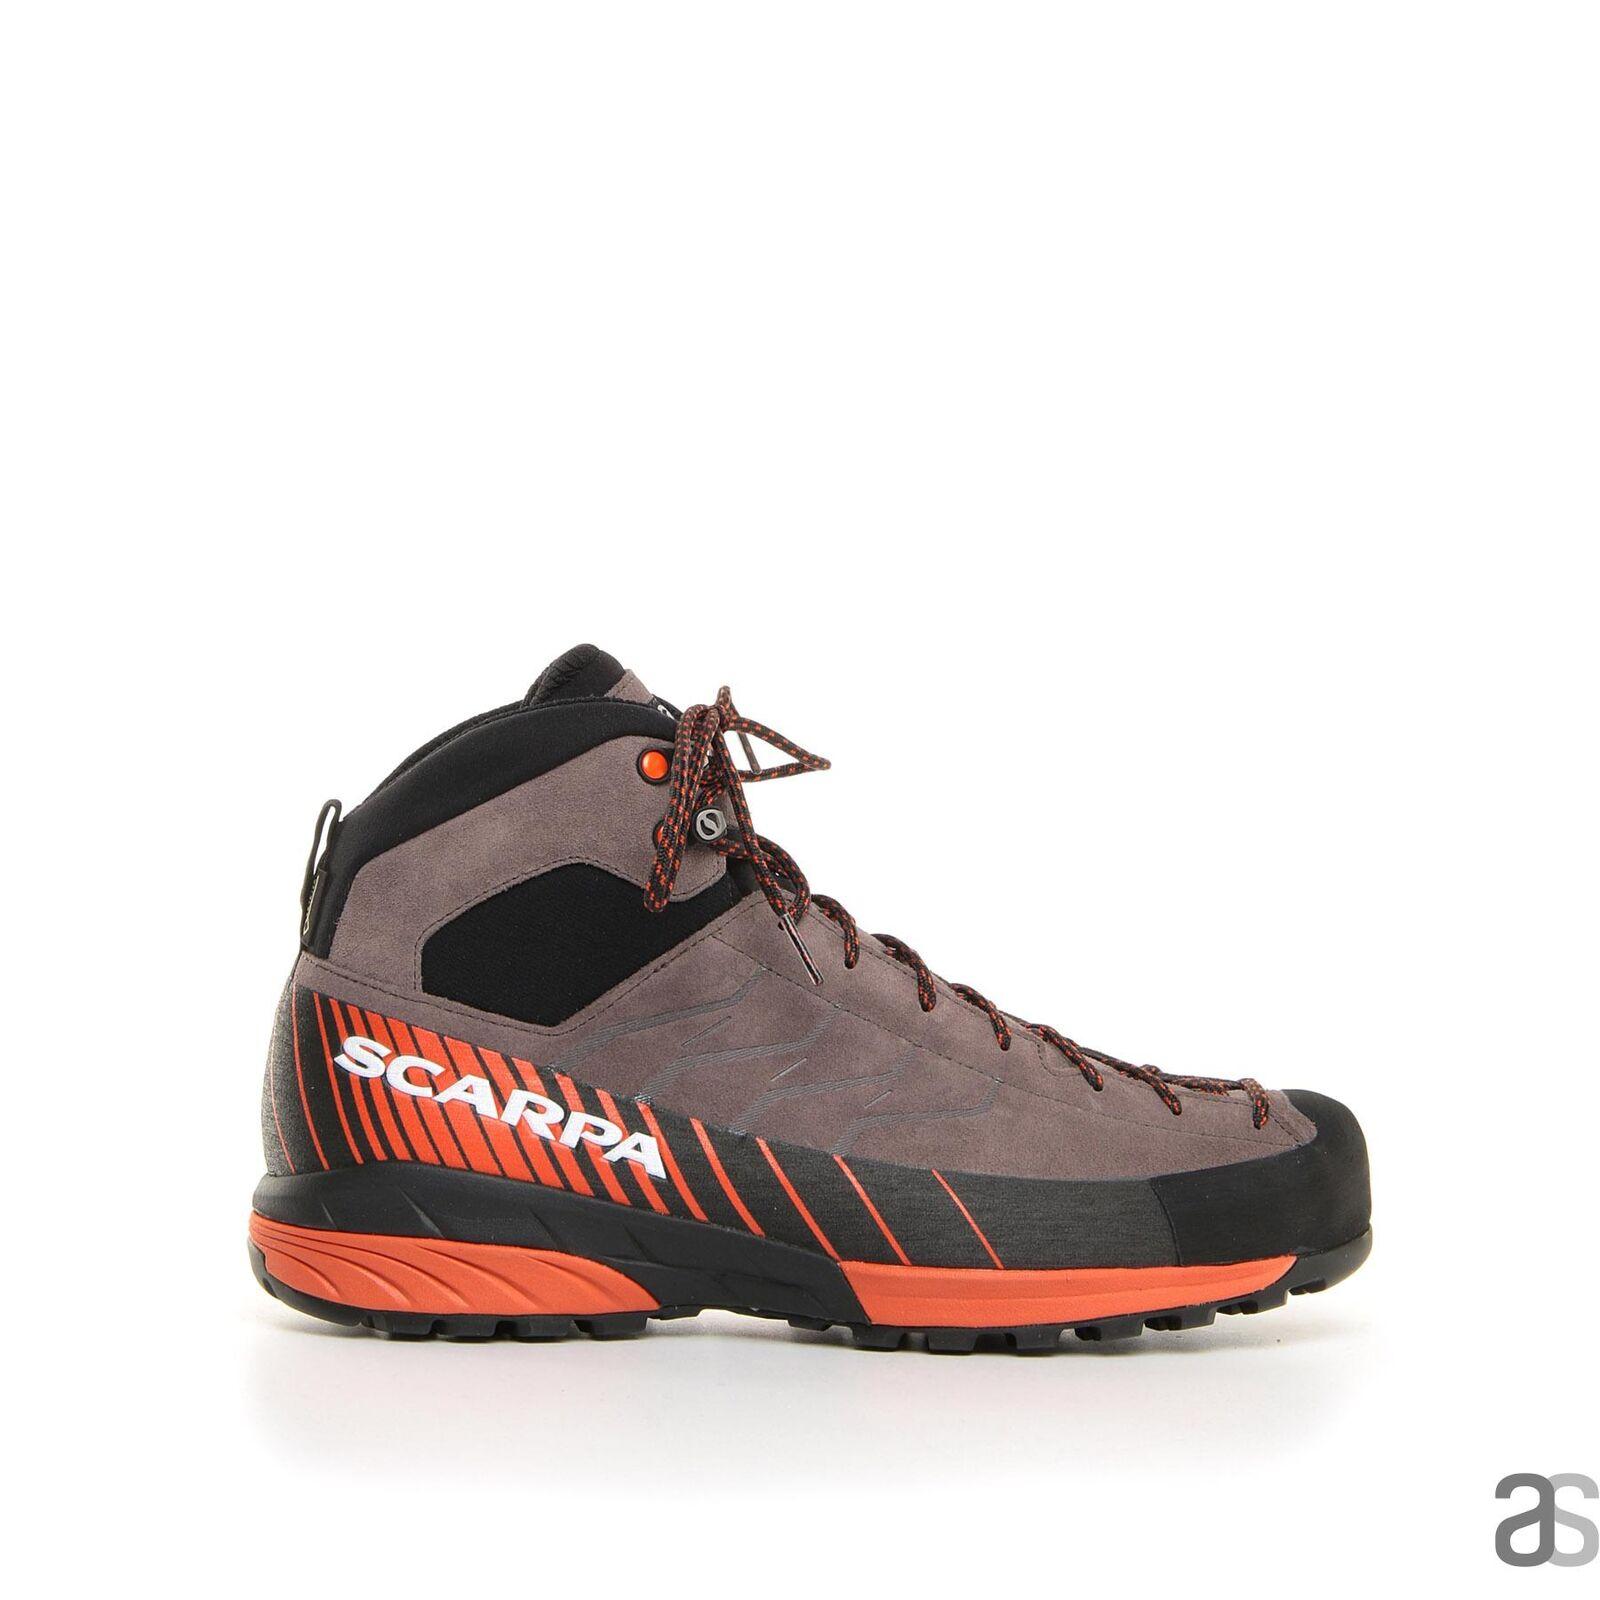 SCARPA MESCALITO MID GTX shoes RANDO HOMME 72095 CHARCOAL